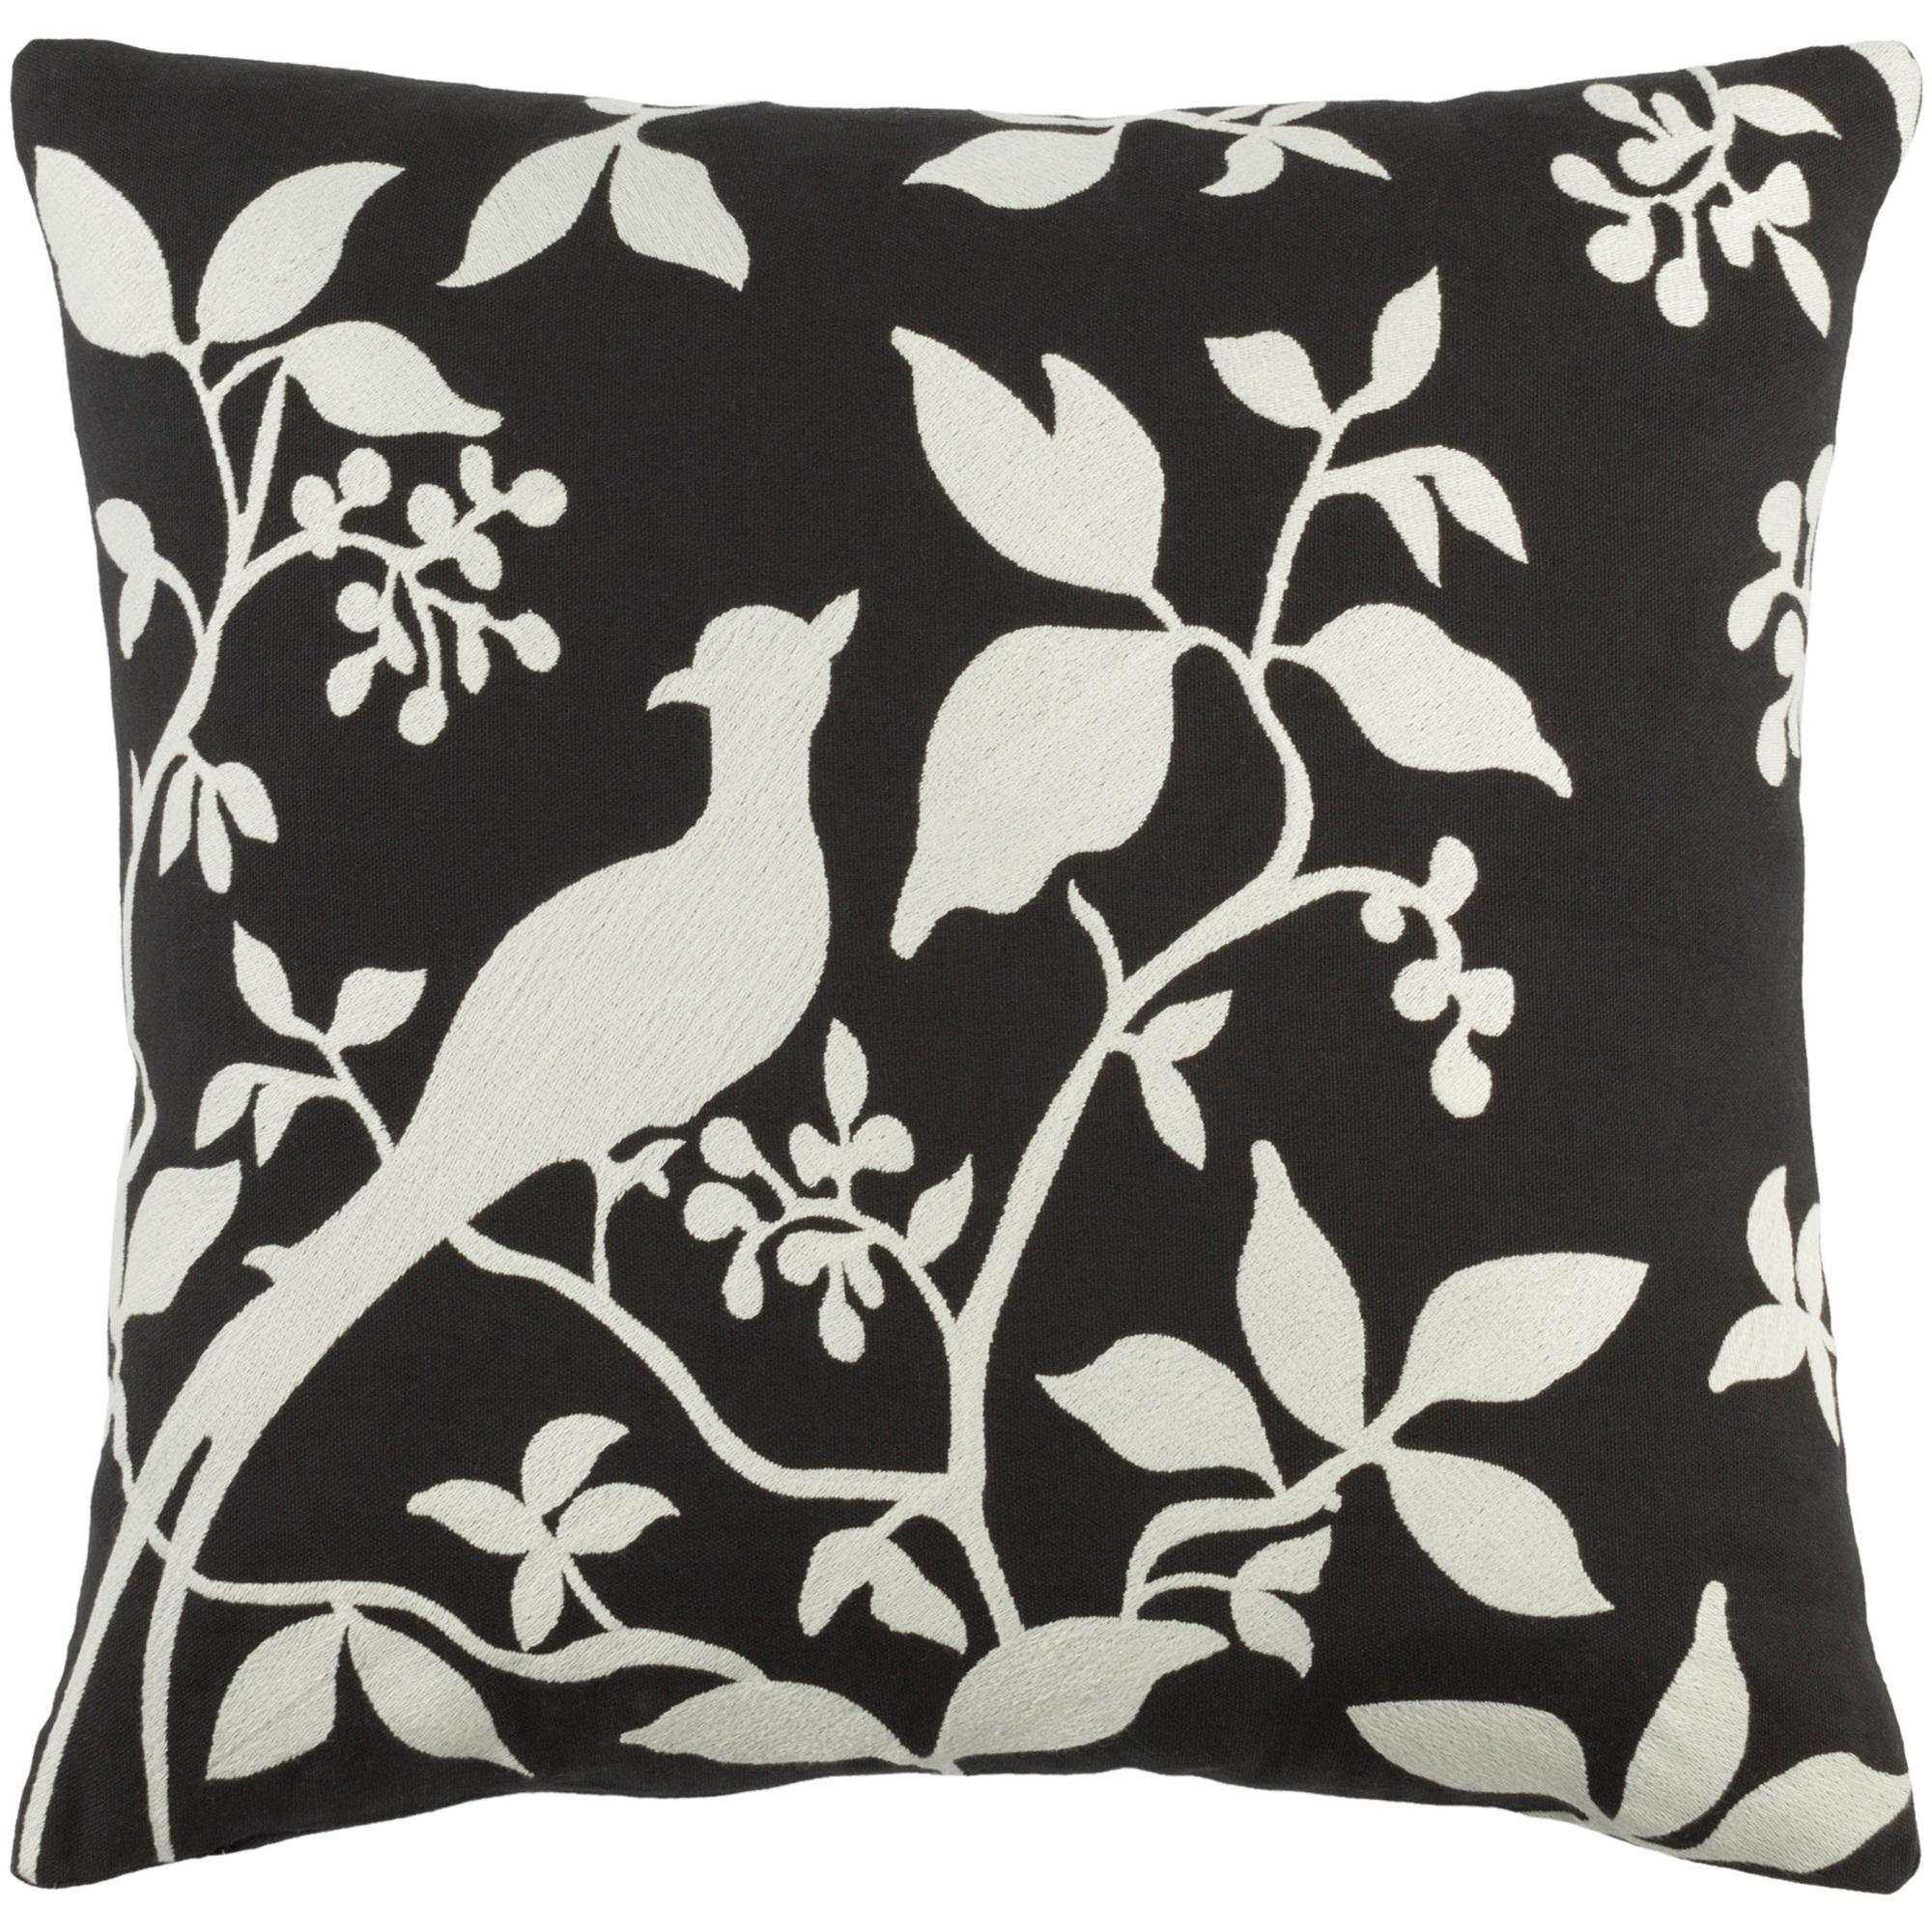 "Artistic Weavers Kingdom Birch 18"" x 18"" Pillow Cover"